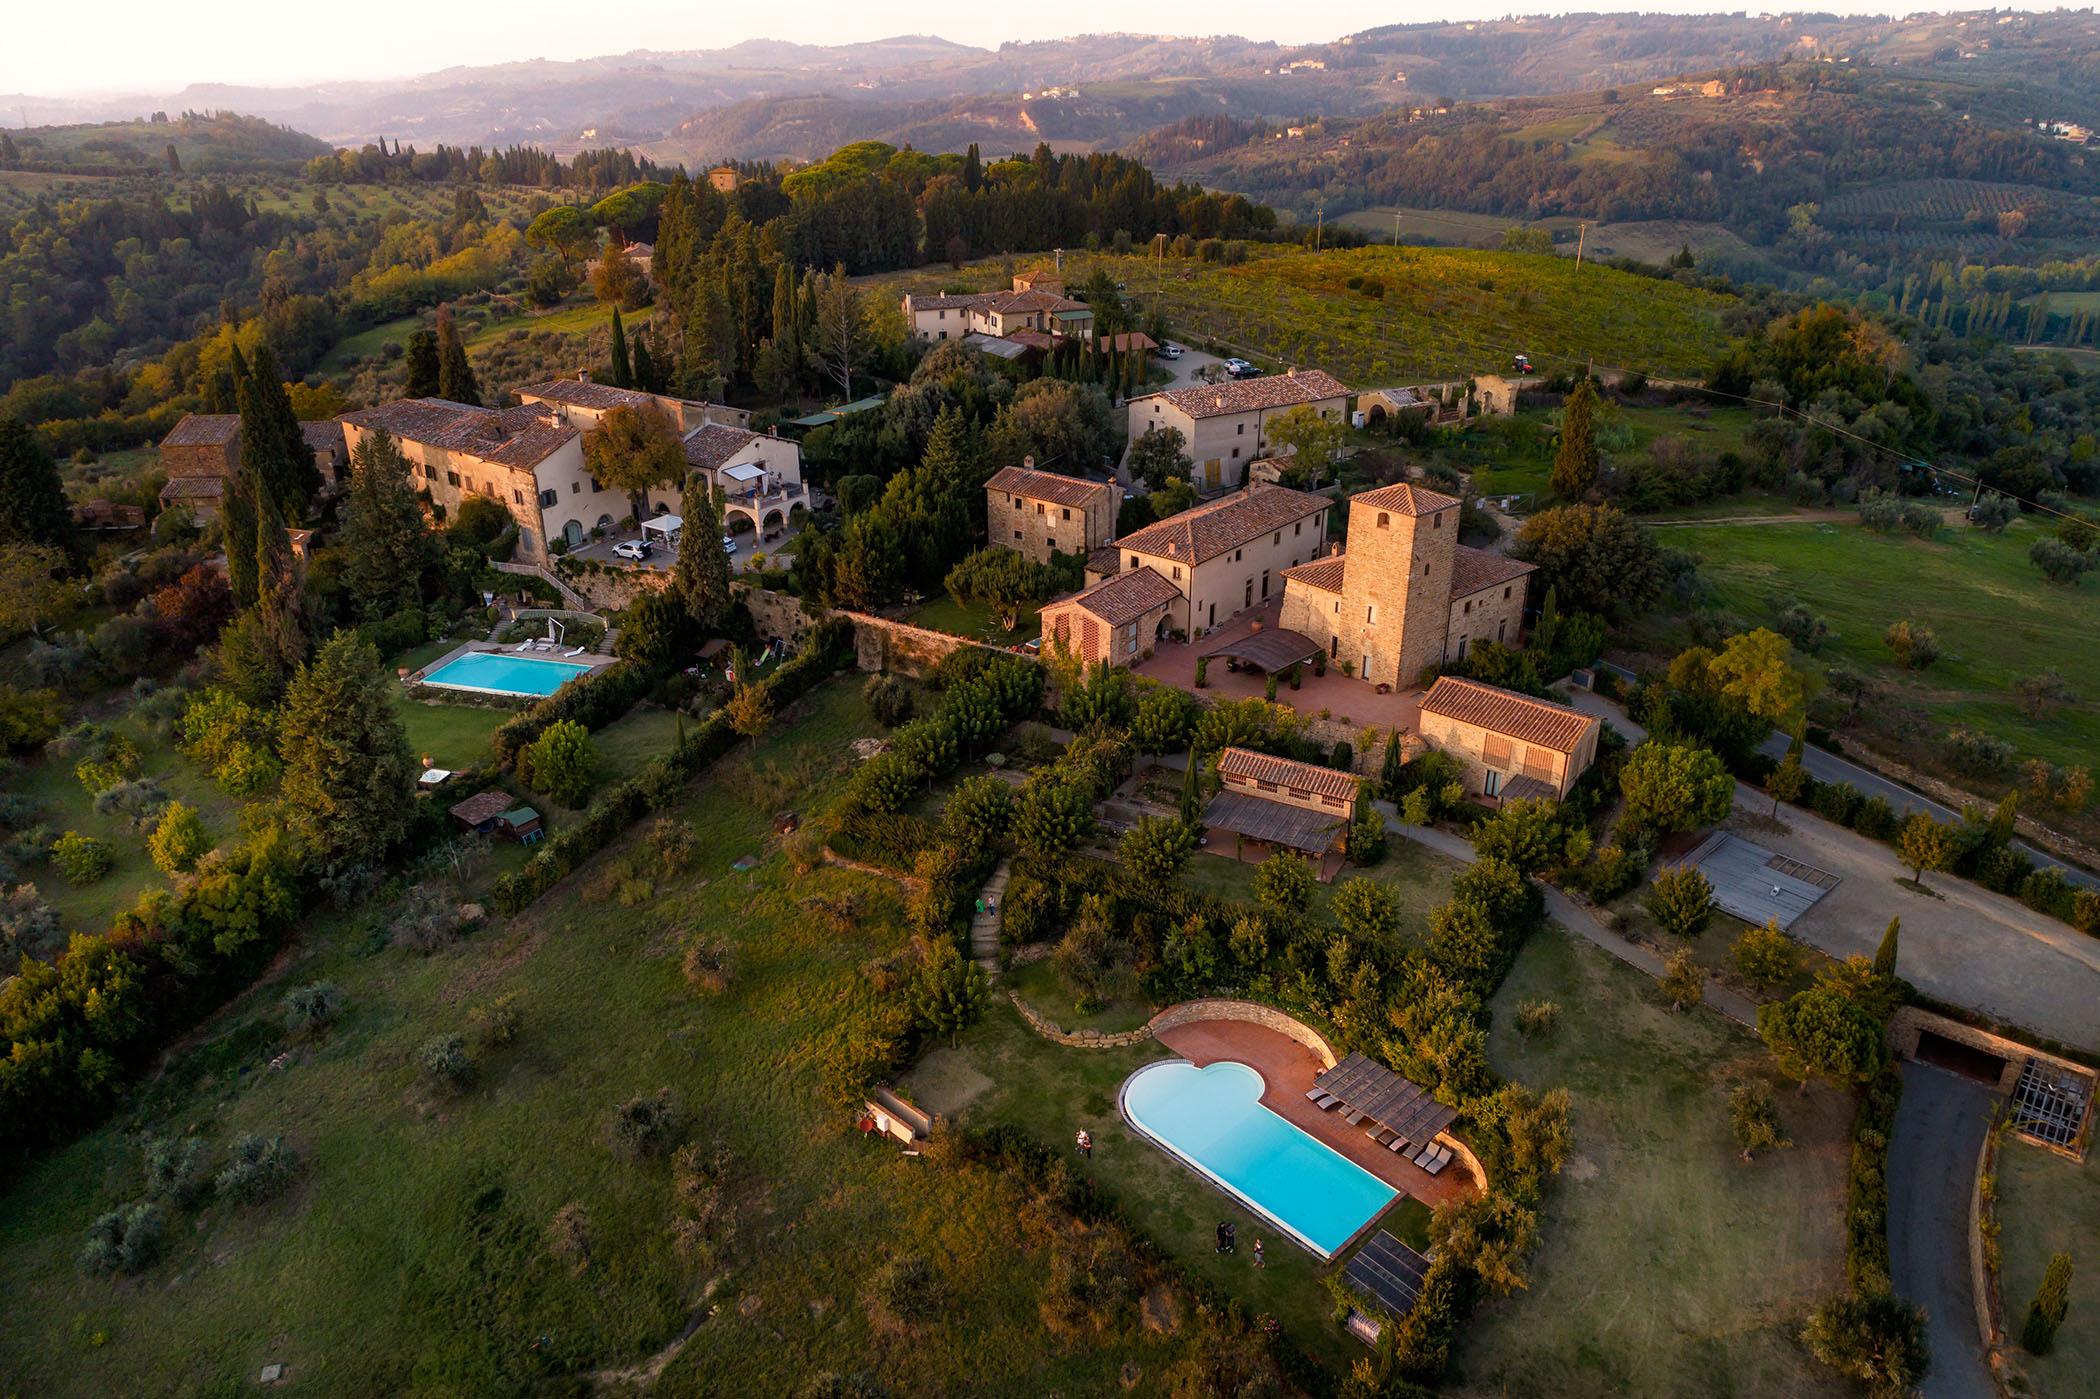 Tuscany Workshop 2018 – TINEFOTO   photography by martin